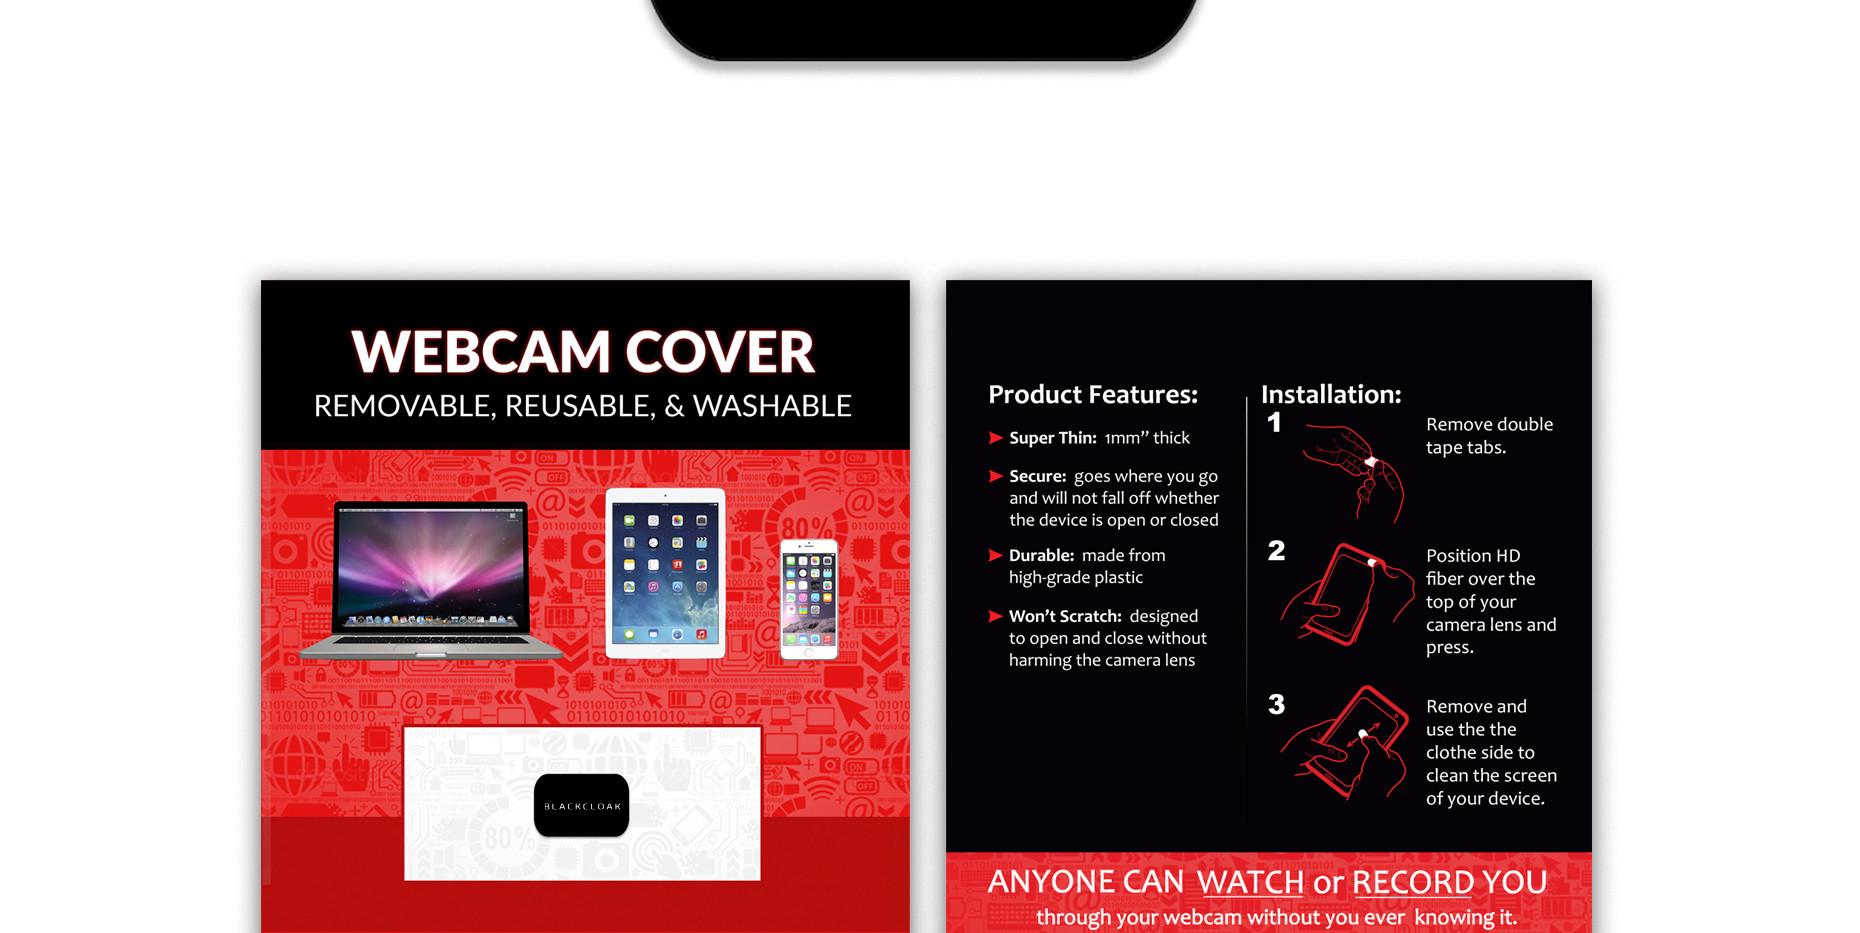 Blackcloak HD Fiber Phone card standard